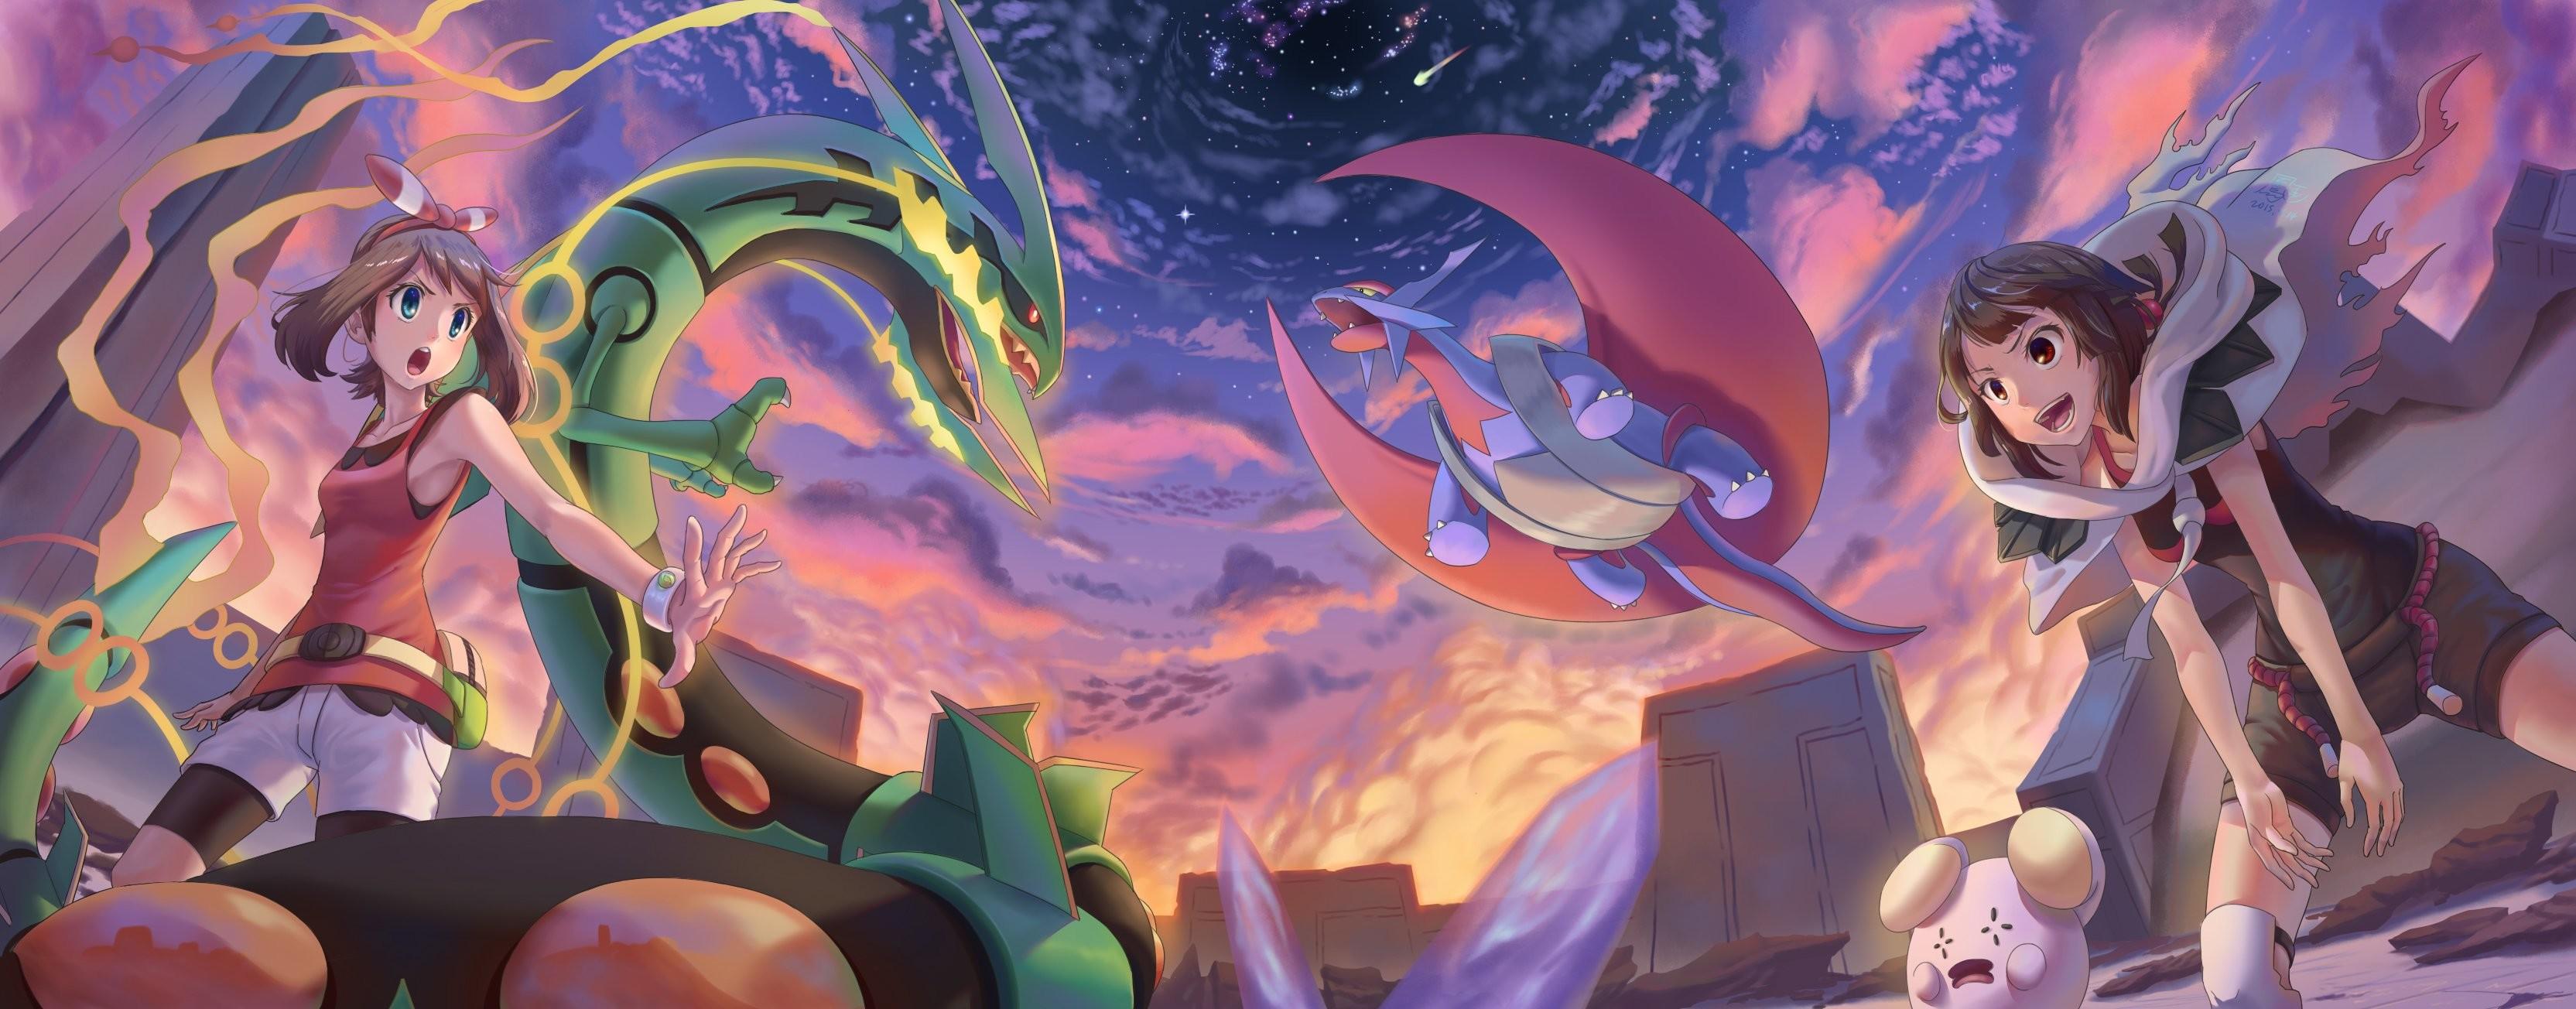 Haruka pokemon mega rayquaza mega salamence pokemon tagme whismur wallpaper  | | 807420 | WallpaperUP